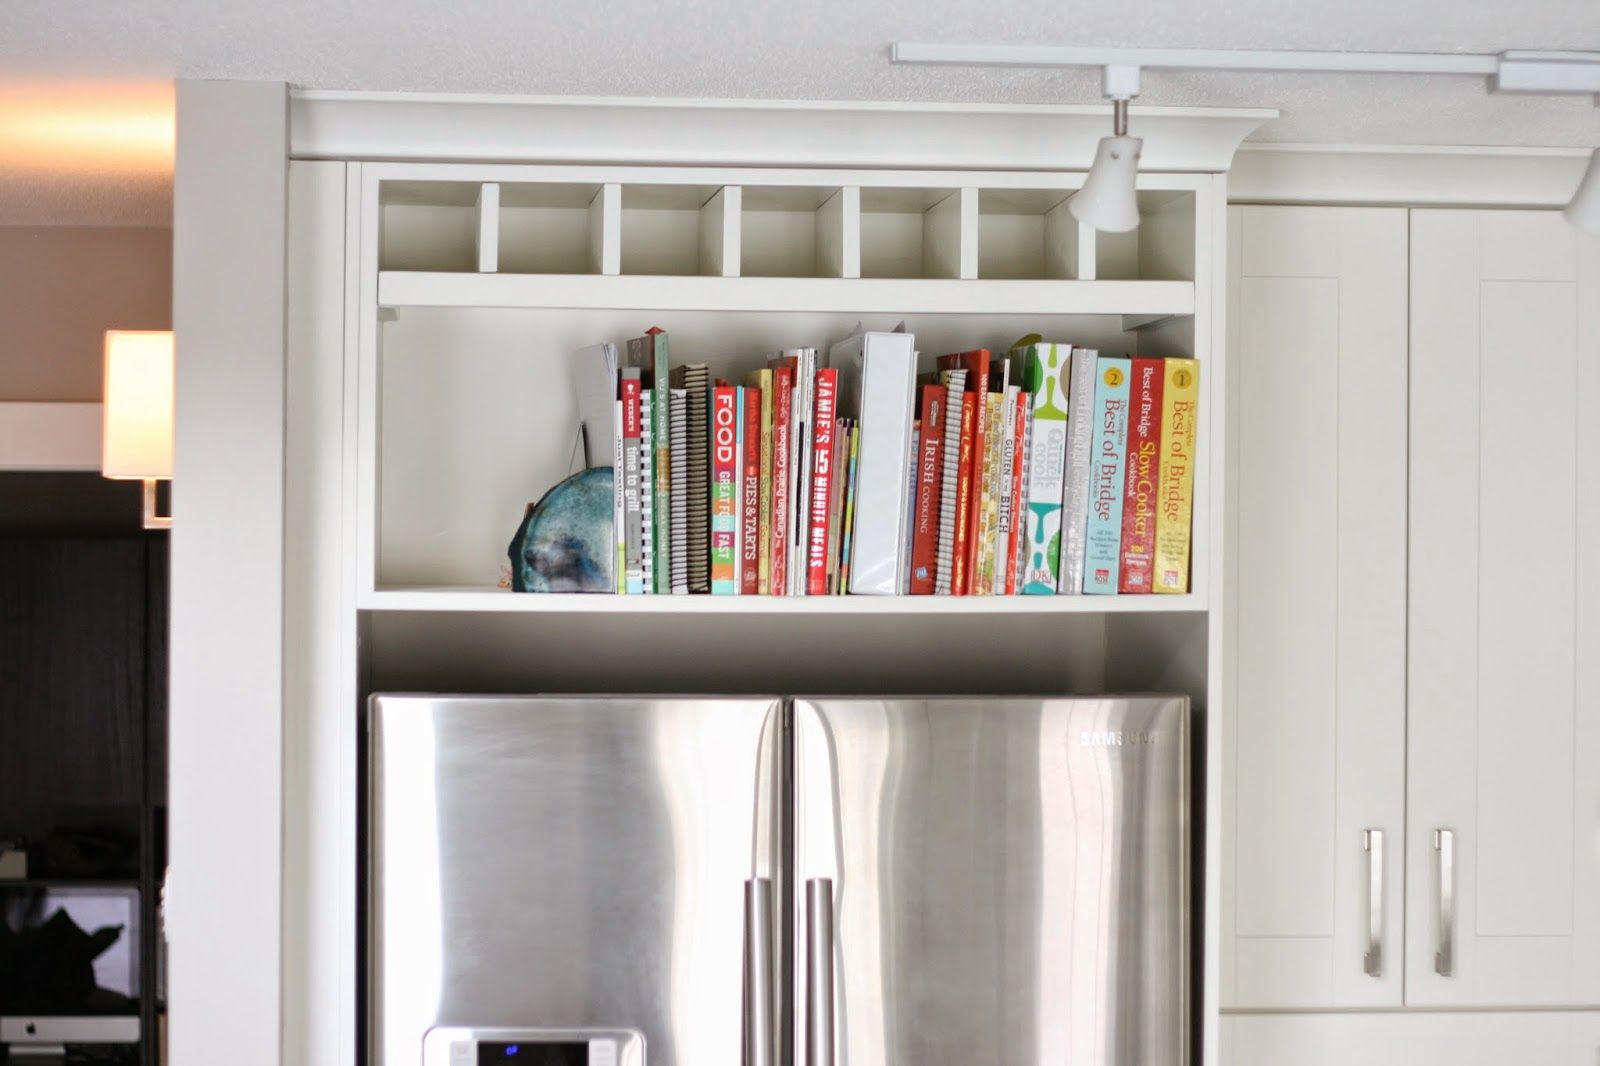 4f8048675ca2382c6929aafa84ac3332 Shelving Above Fridge Kitchen Ideas on windows above fridge, lighting above fridge, cabinets above fridge, baskets above fridge,